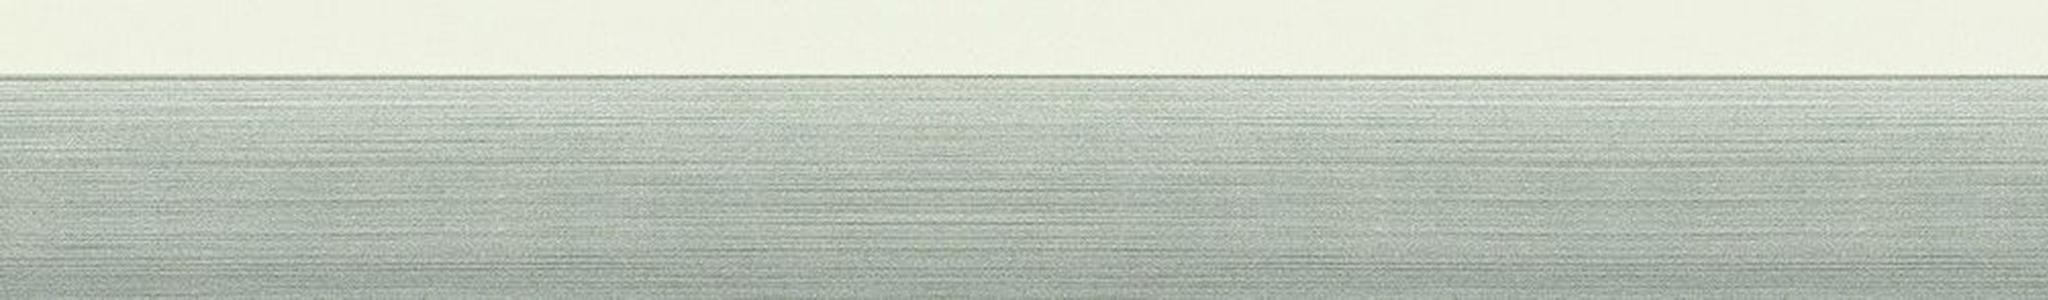 HD 29120 Acryl 3D Edge Steel-White